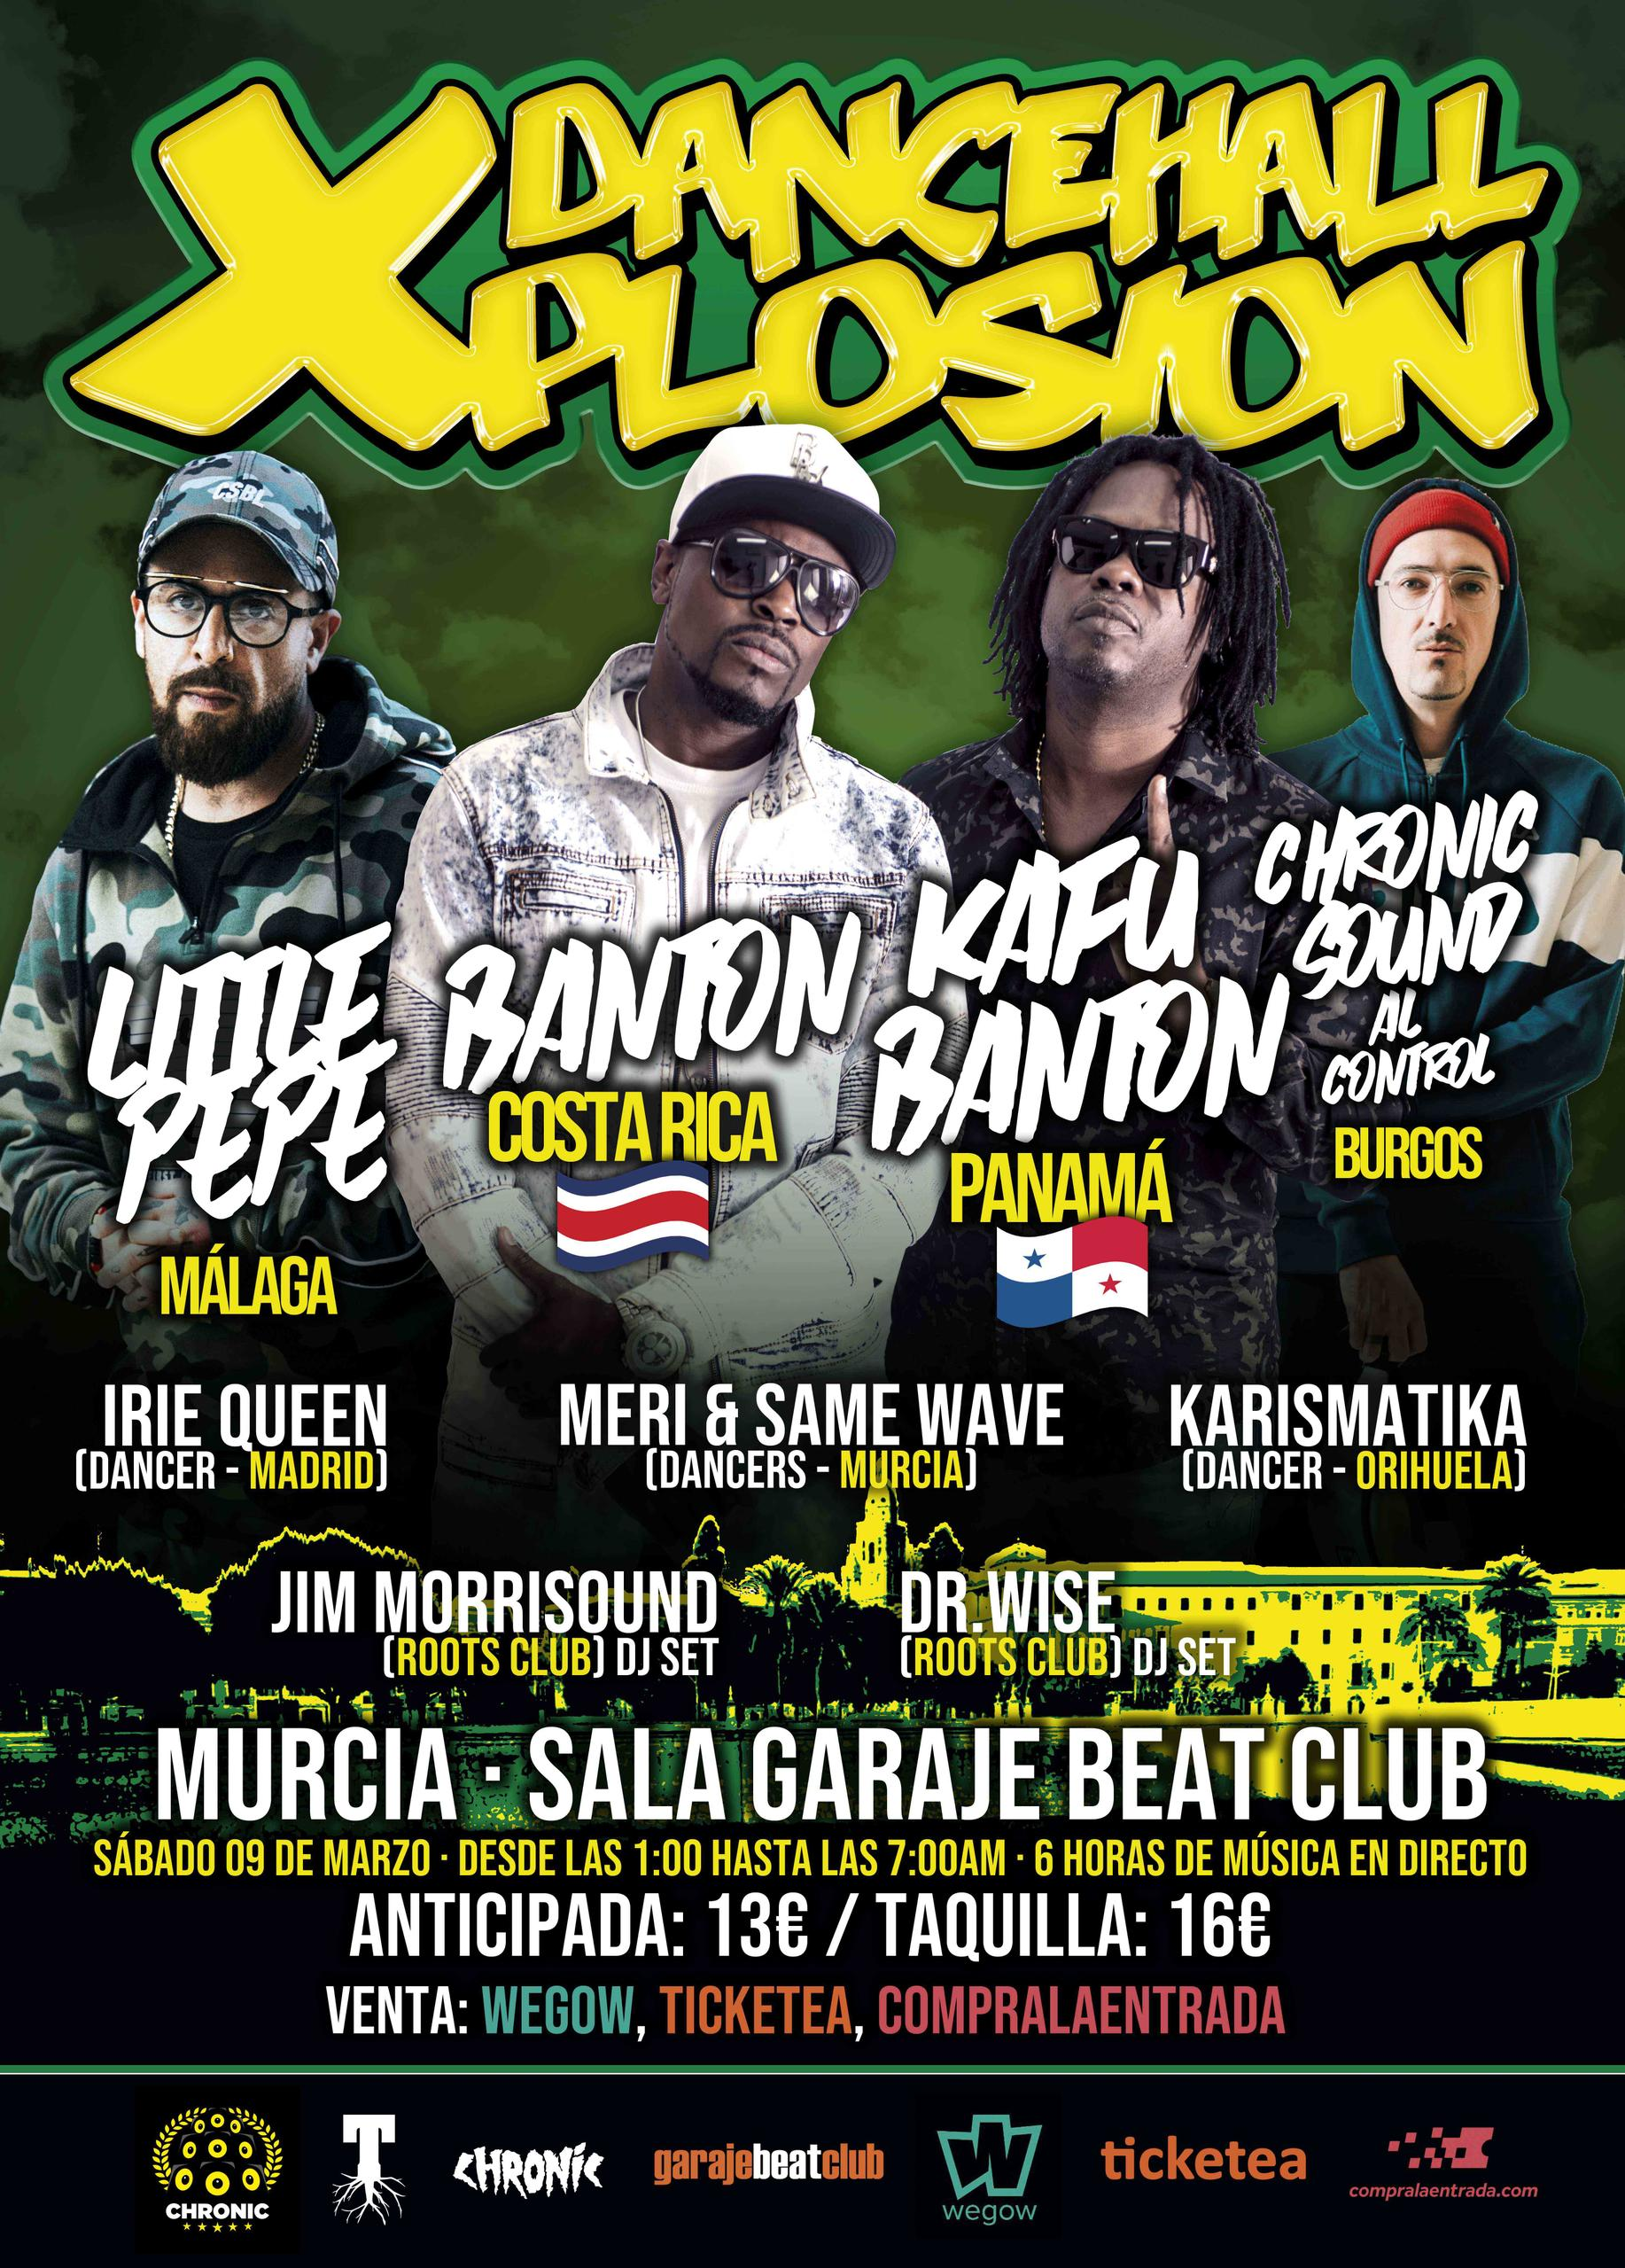 Cartel Final Dancehall Xplosion Murcia #DxMurcia